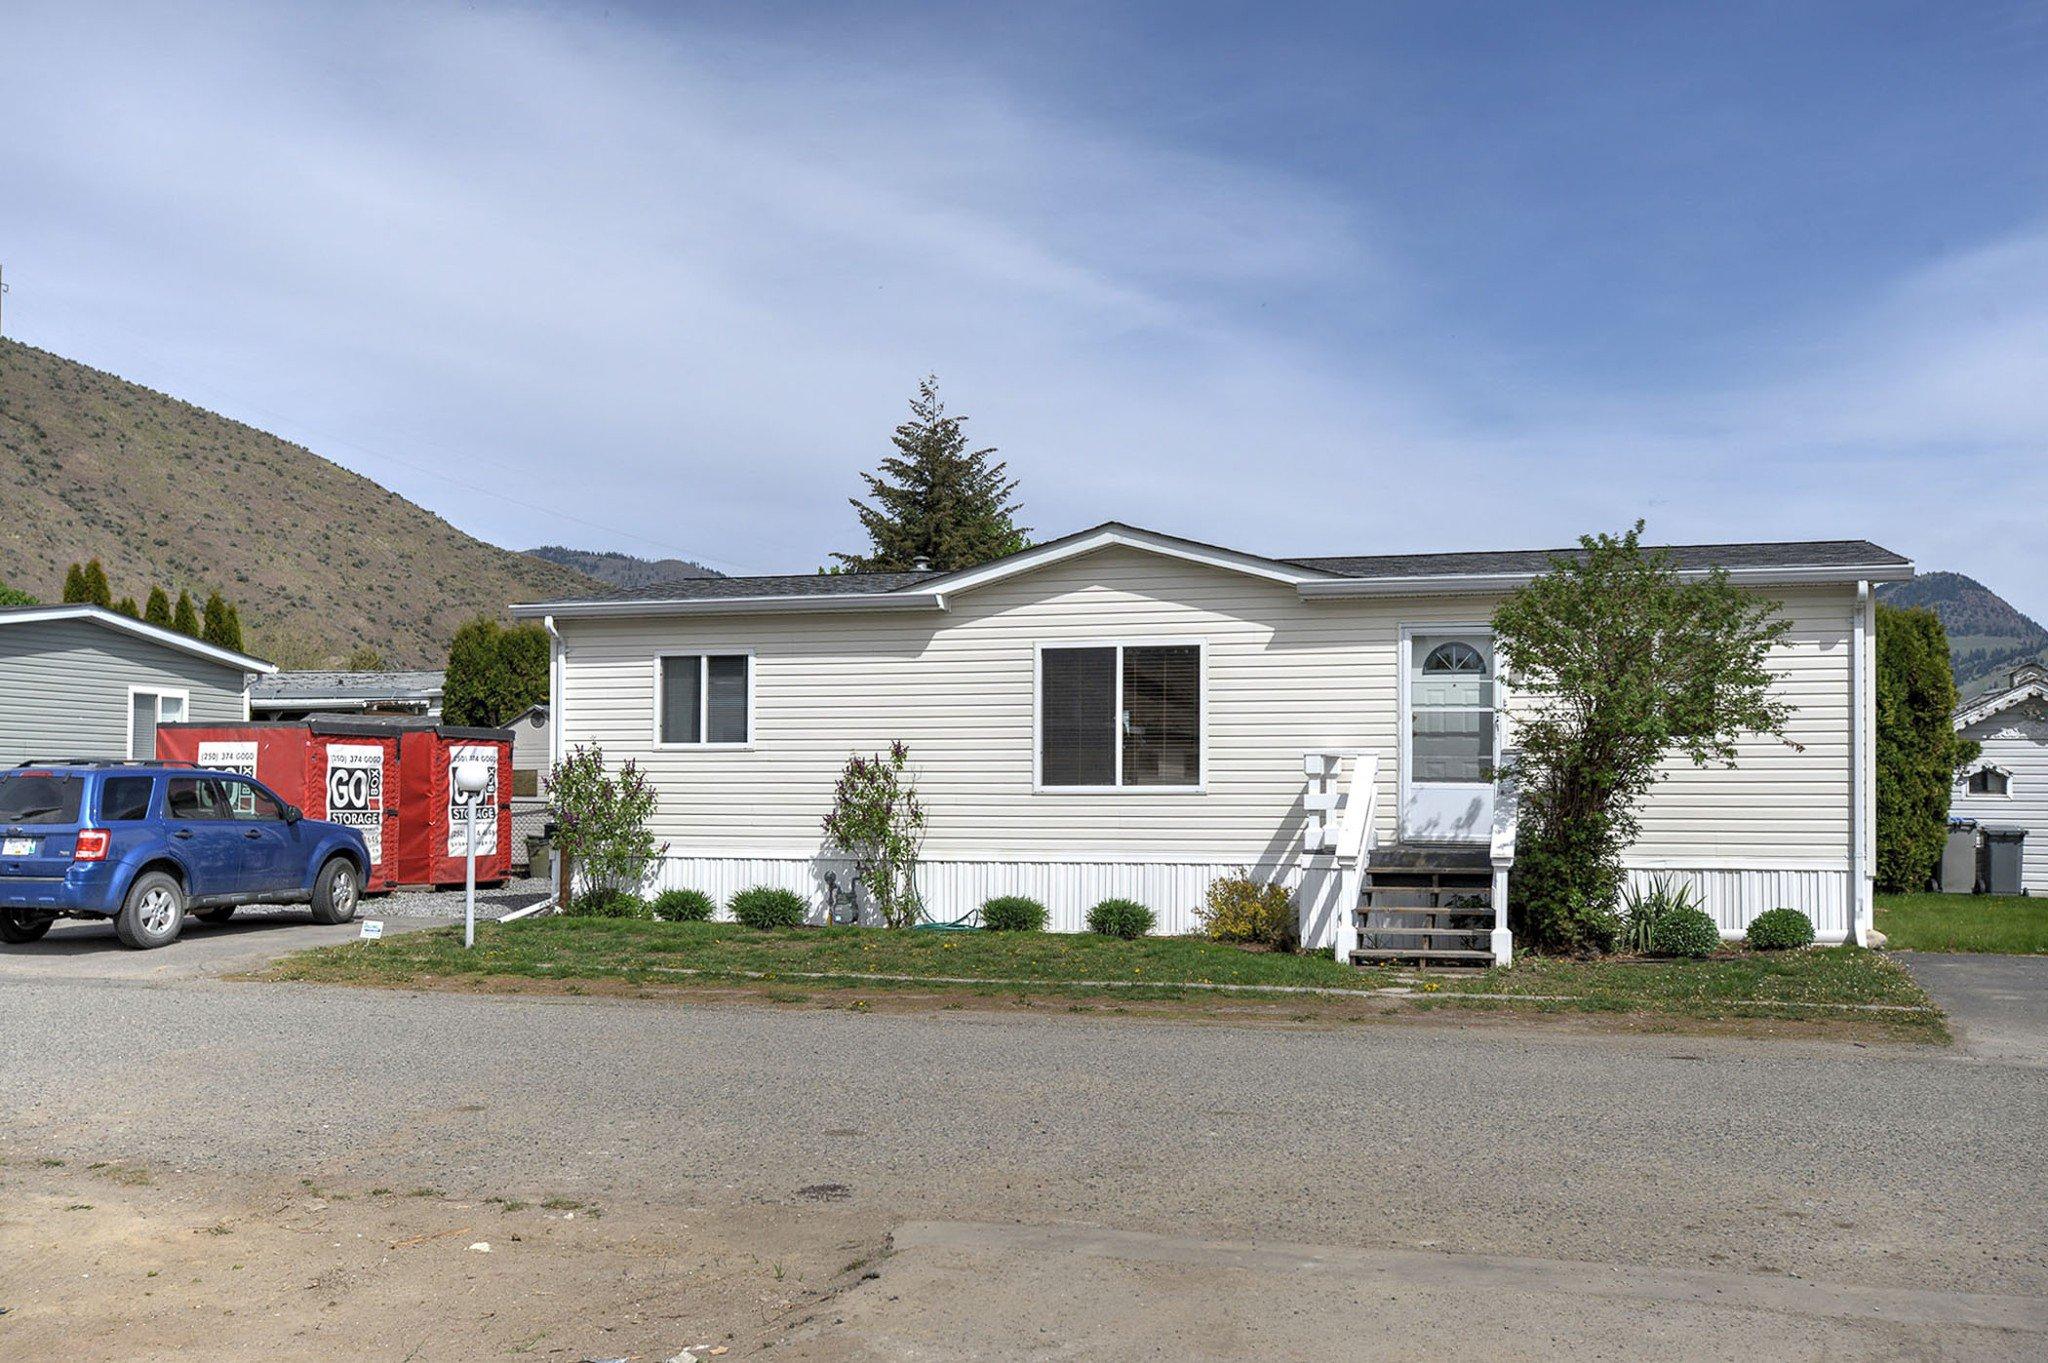 Main Photo: 134 1655 Ord Rd in Kamloops: Brock Manufactured Home for sale : MLS®# 151211